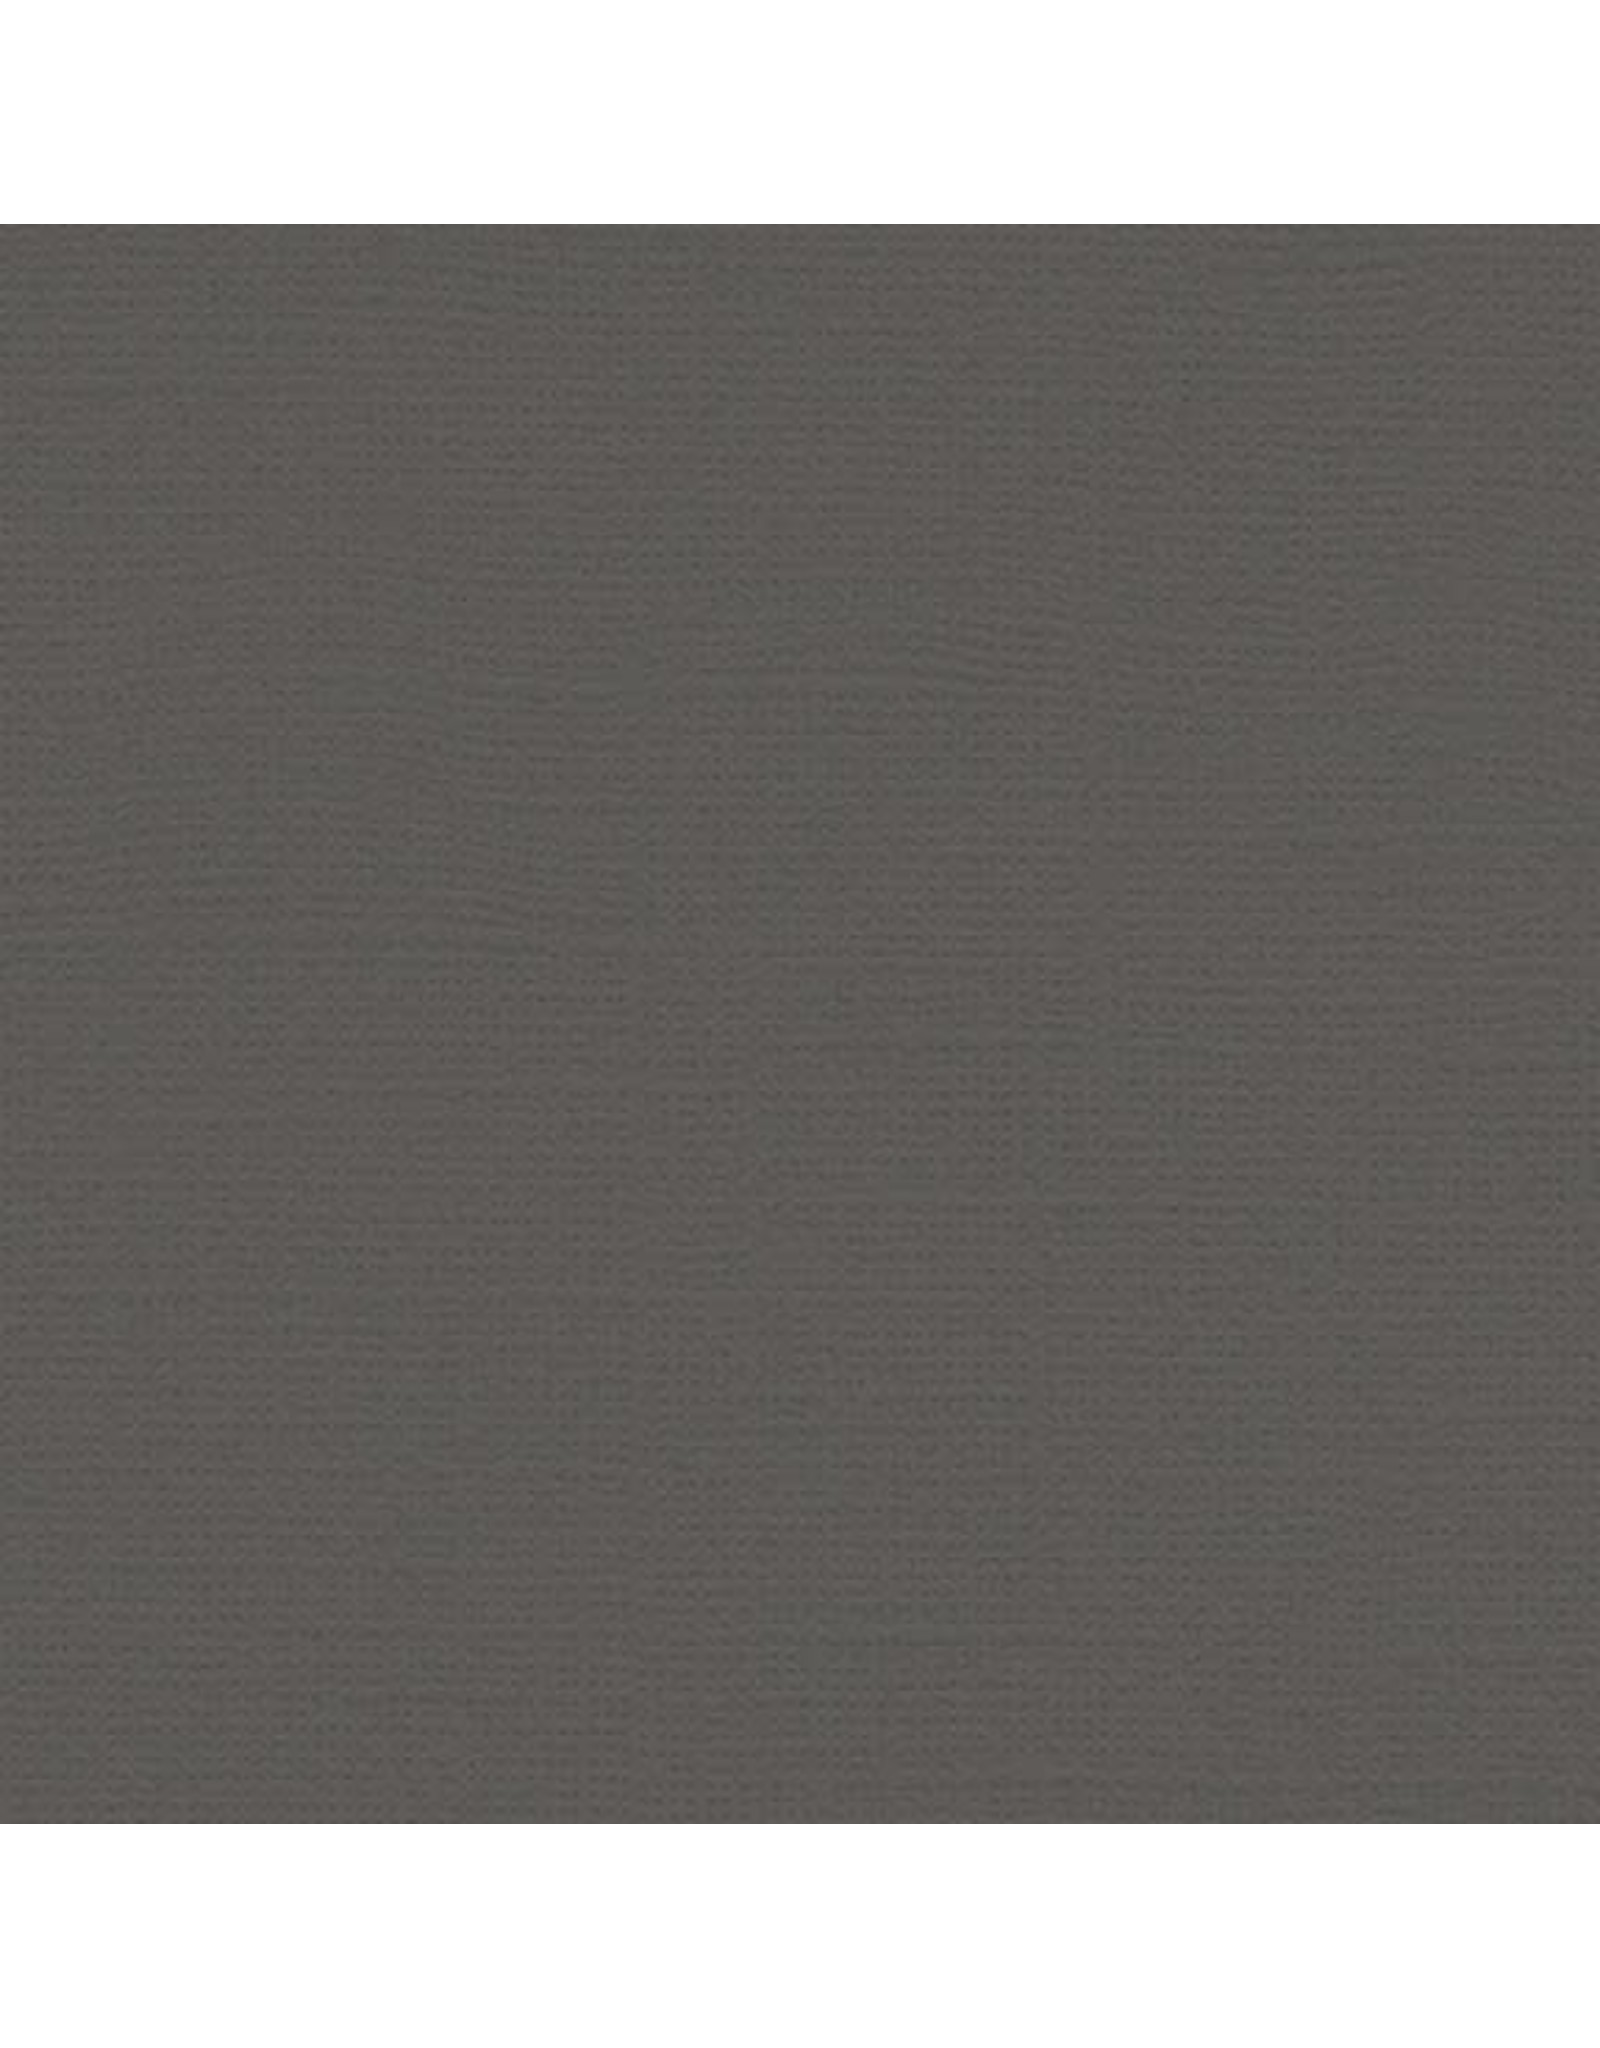 My Colors 12x12 Cloak Gray 154